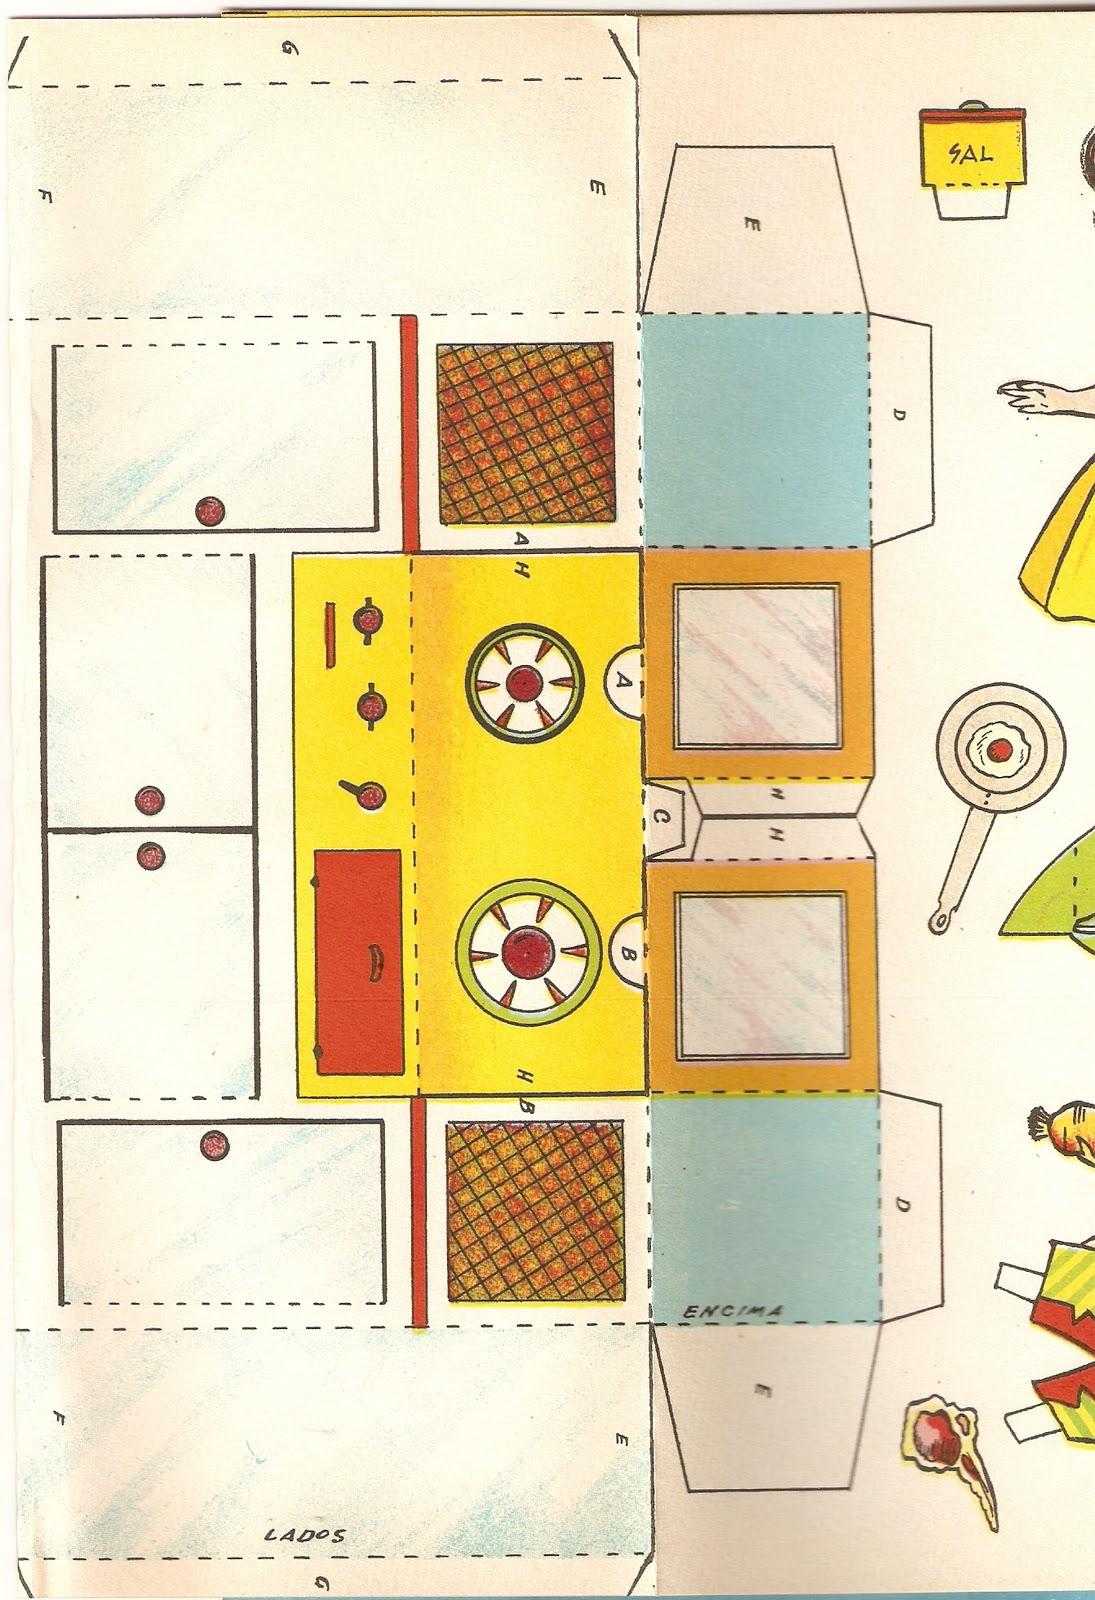 Muebles de cocina para armar de papel ideas for Como montar muebles de cocina